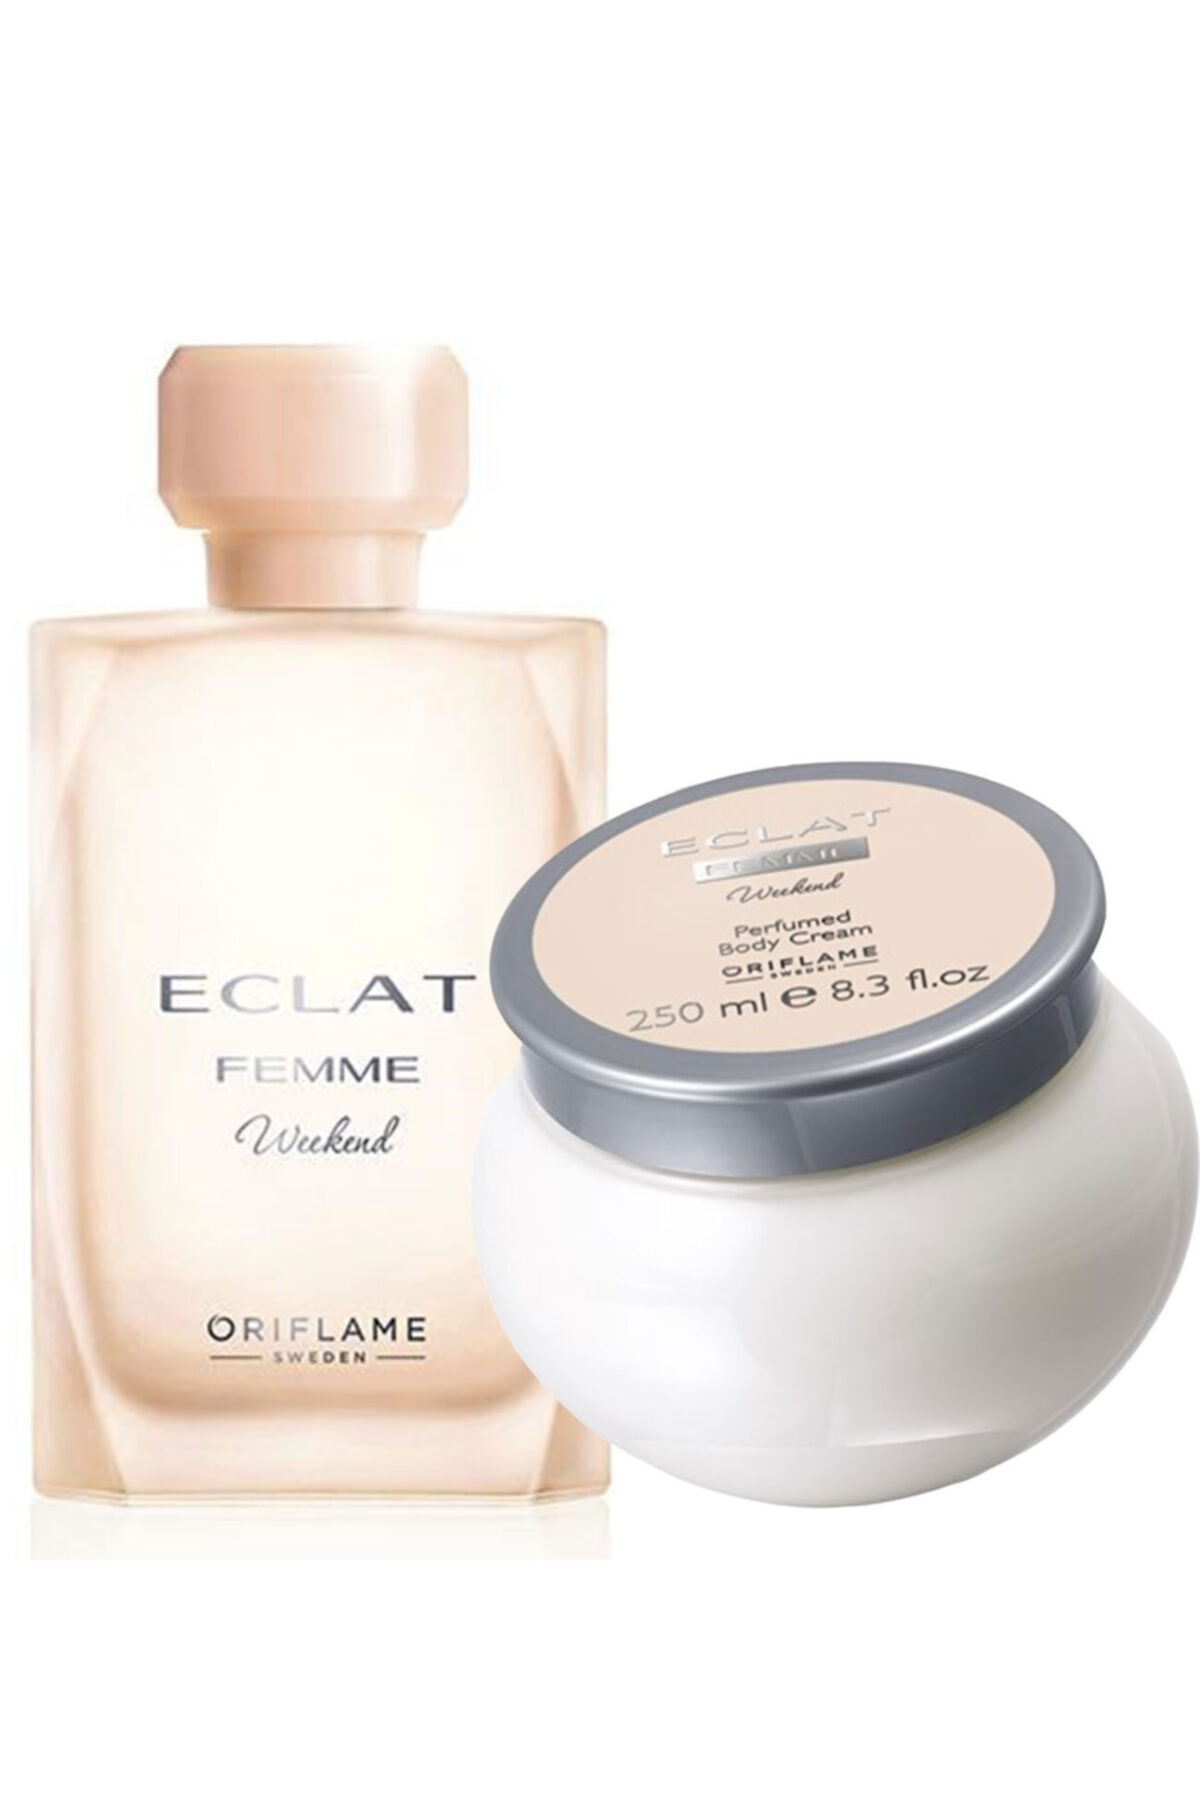 Oriflame Eclat Femme Weekend Edt 50 Ml Kadın Parfüm Ve Vücut Krem Seti 1